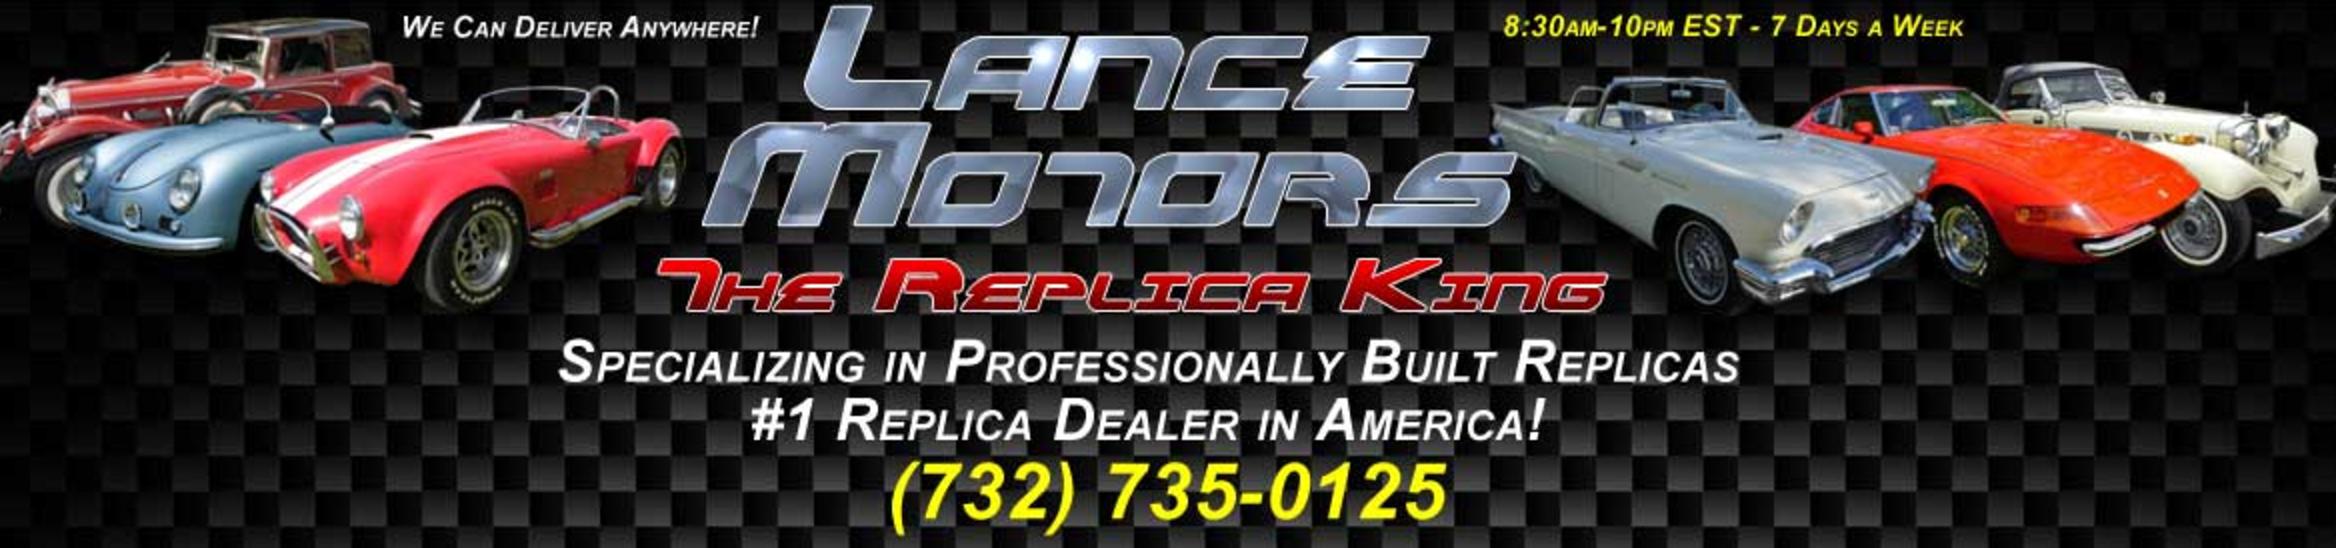 North-carolina Classic Car Dealerships | All Collector Cars